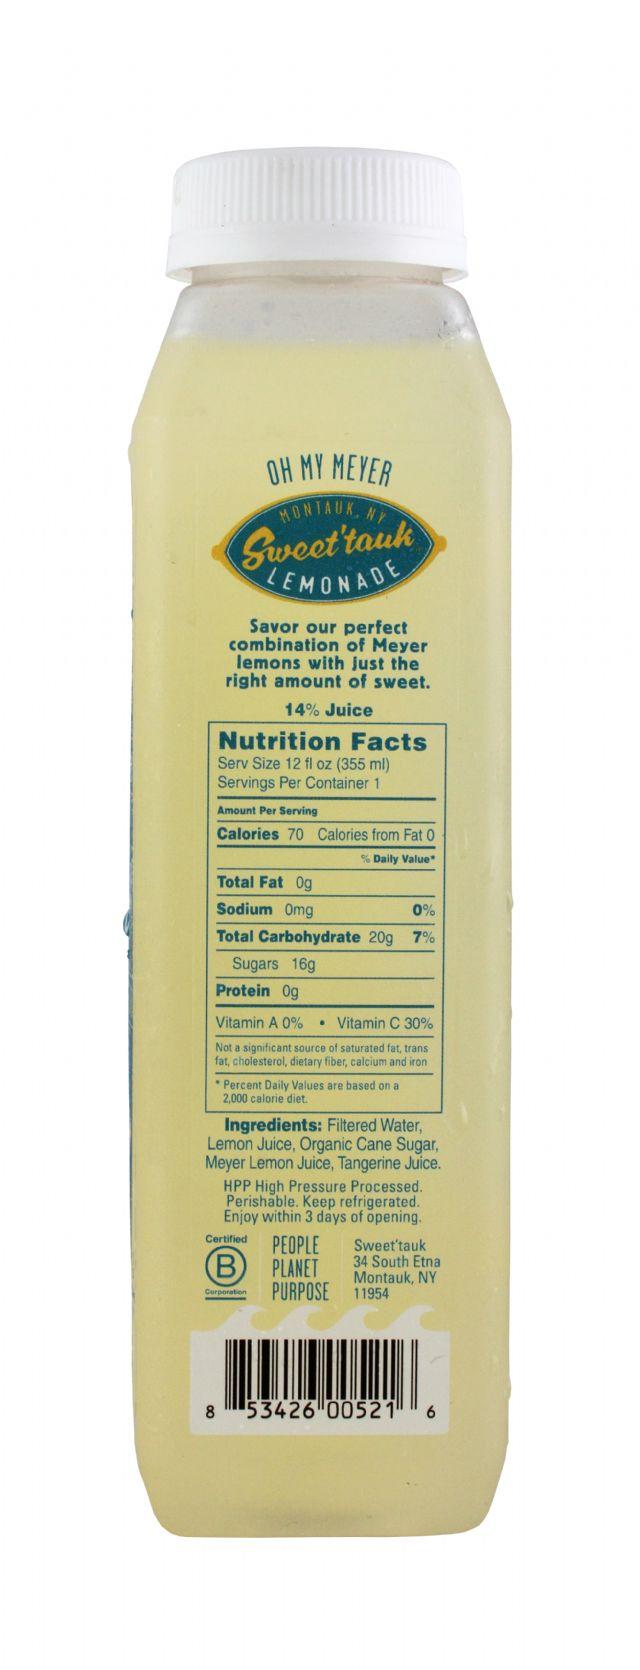 Sweet'tauk Lemonade: SweetTaulk OhMyMeyer Facts